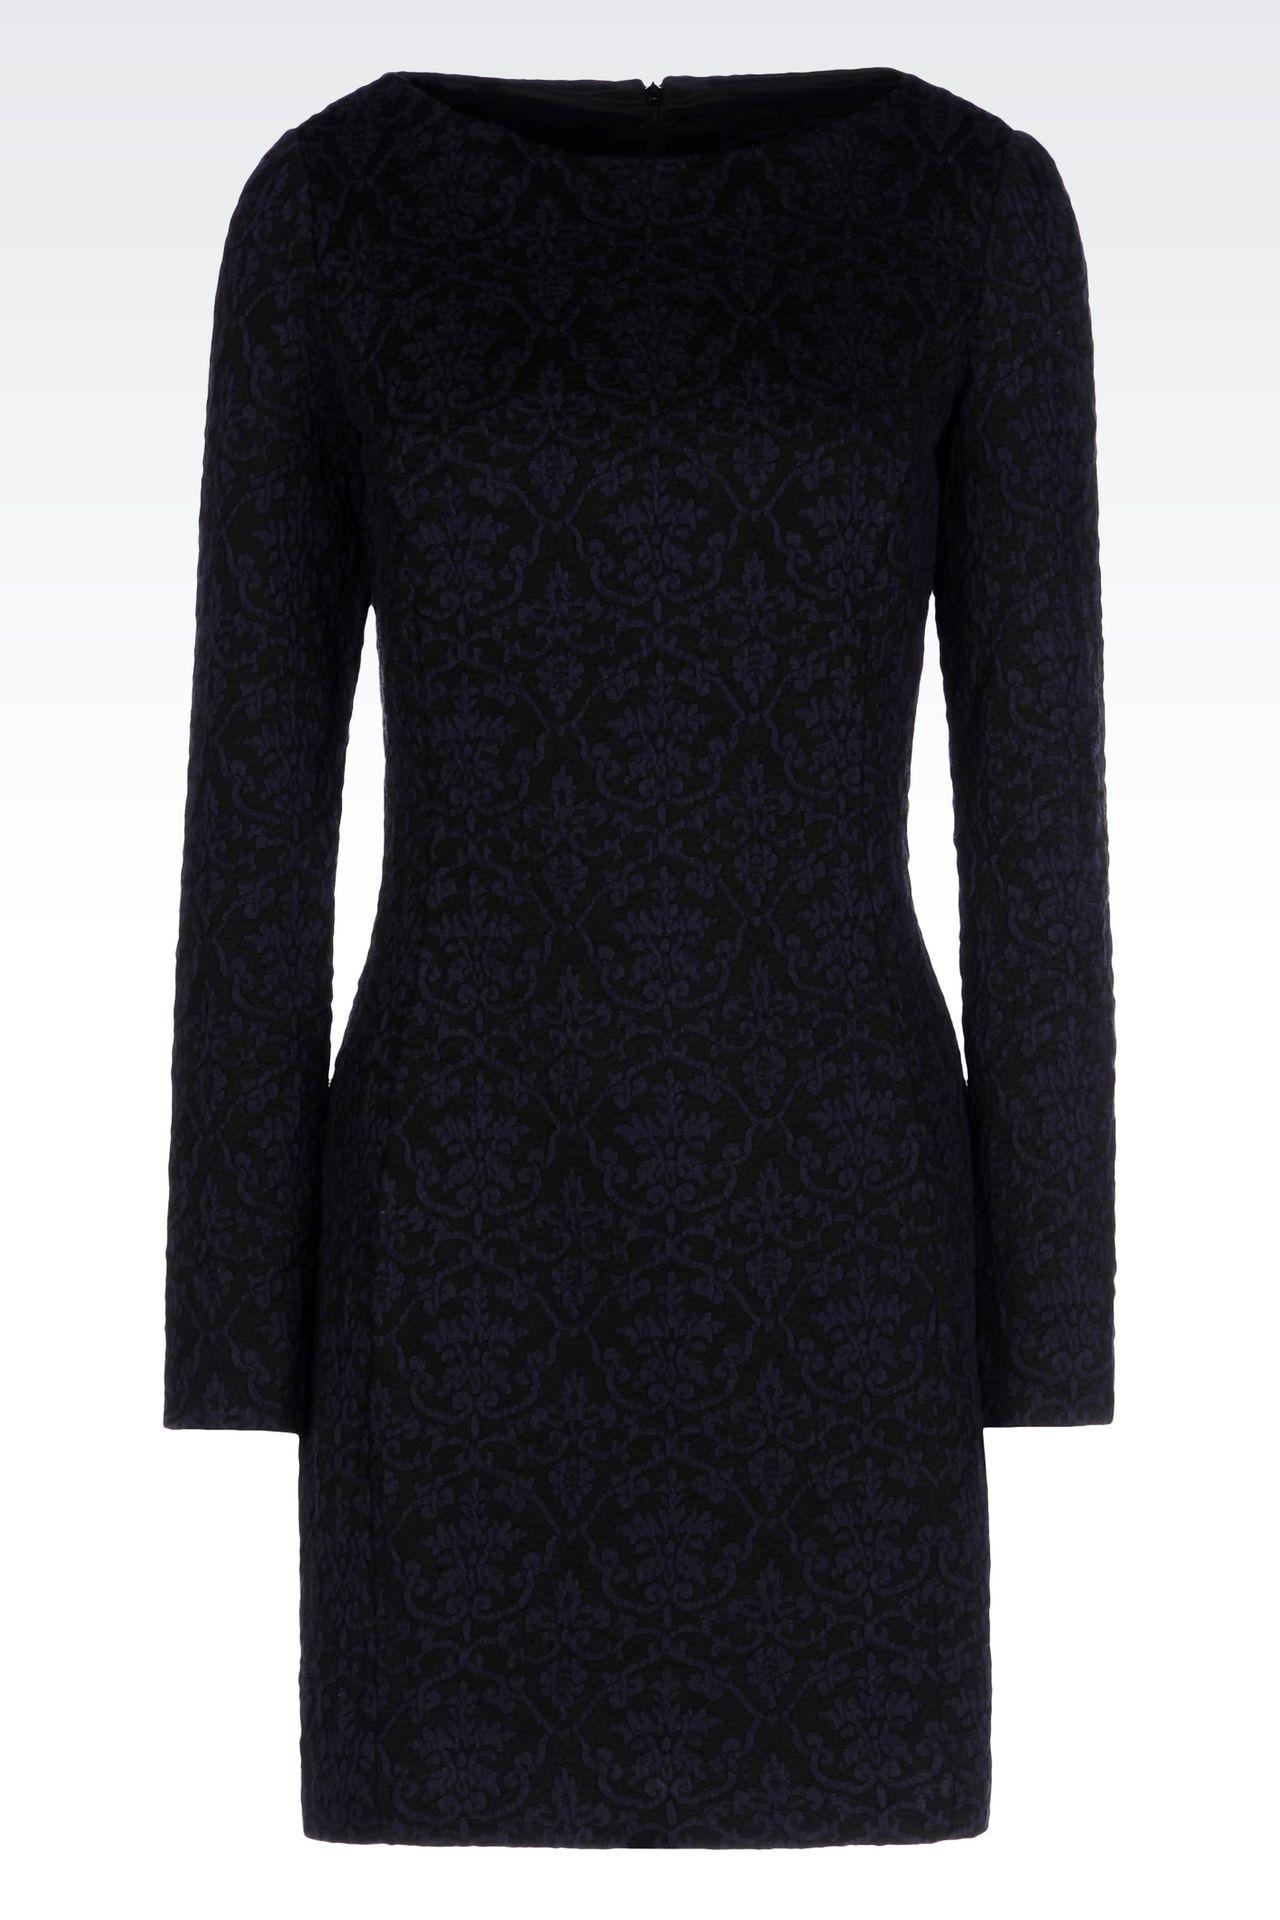 DRESS IN JACQUARD JERSEY: Short Dresses Women by Armani - 0